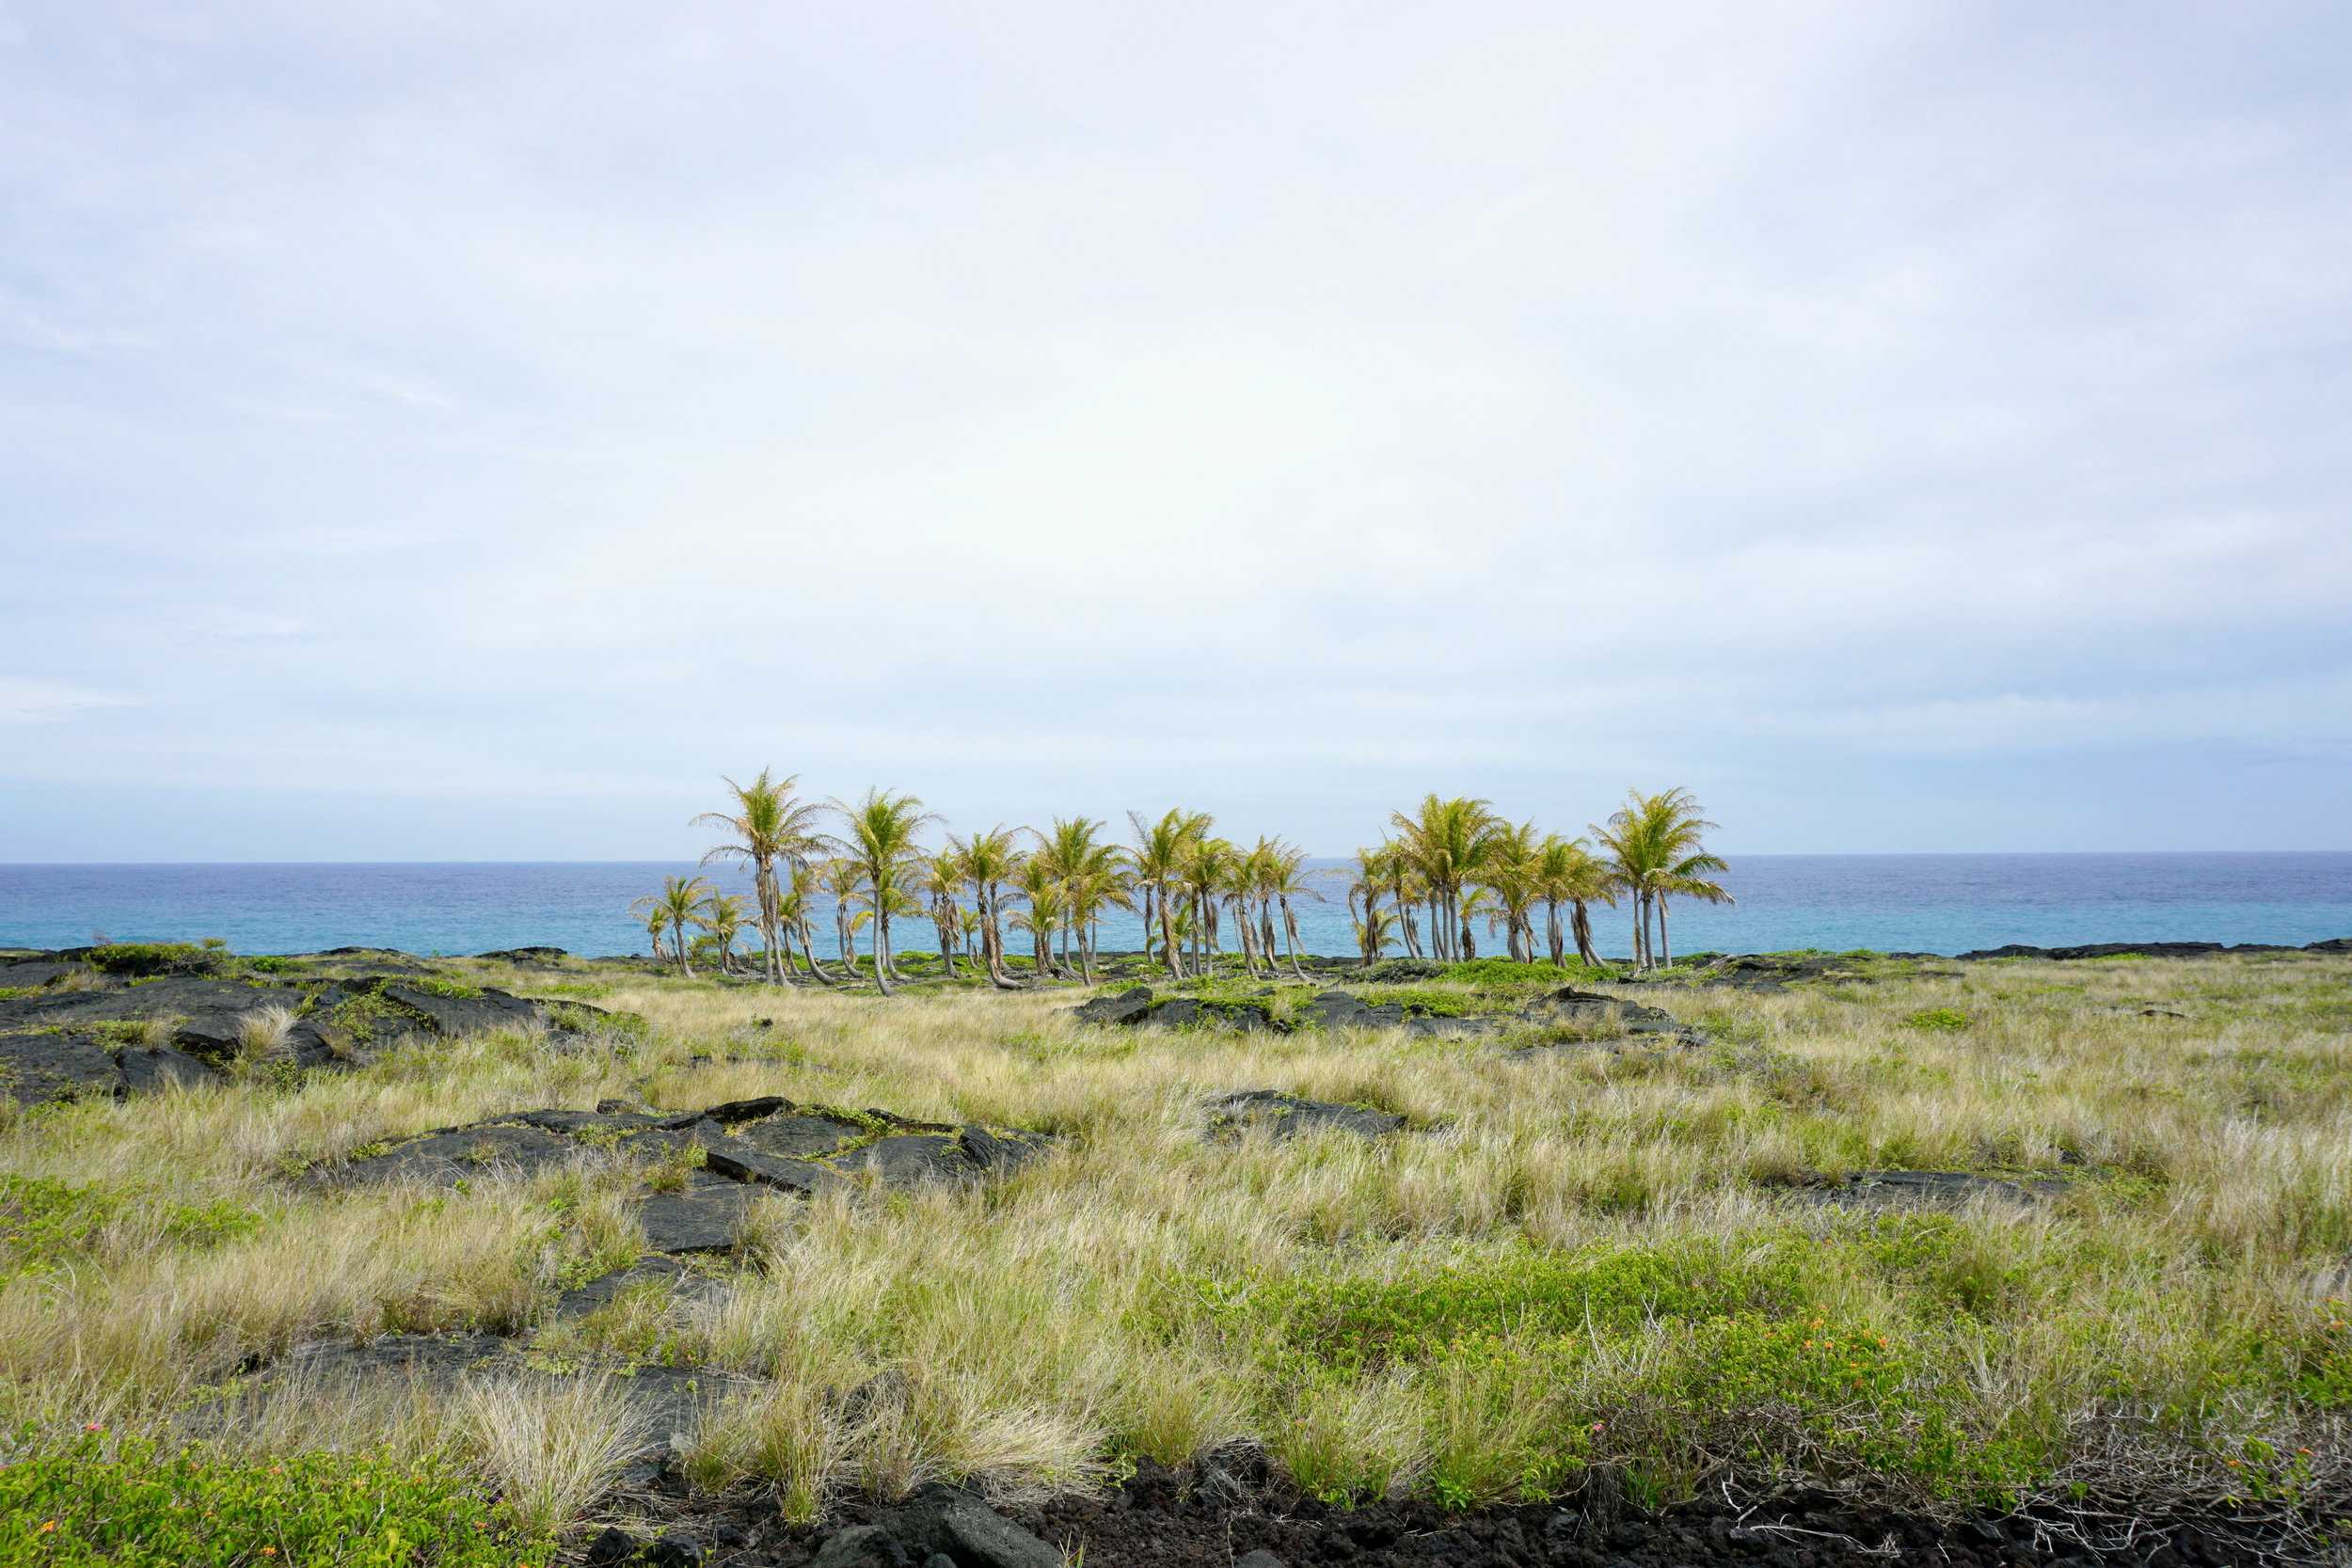 volcanoe-national-park-palm-trees-nora-knox.jpg